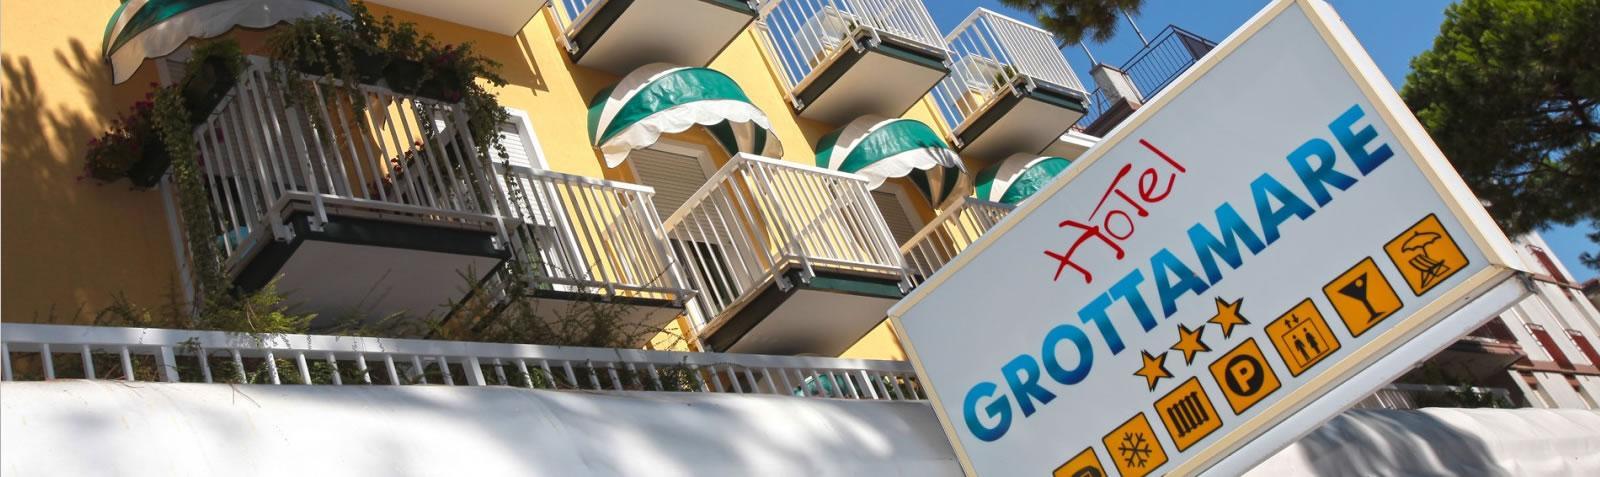 Hotel Grottamare